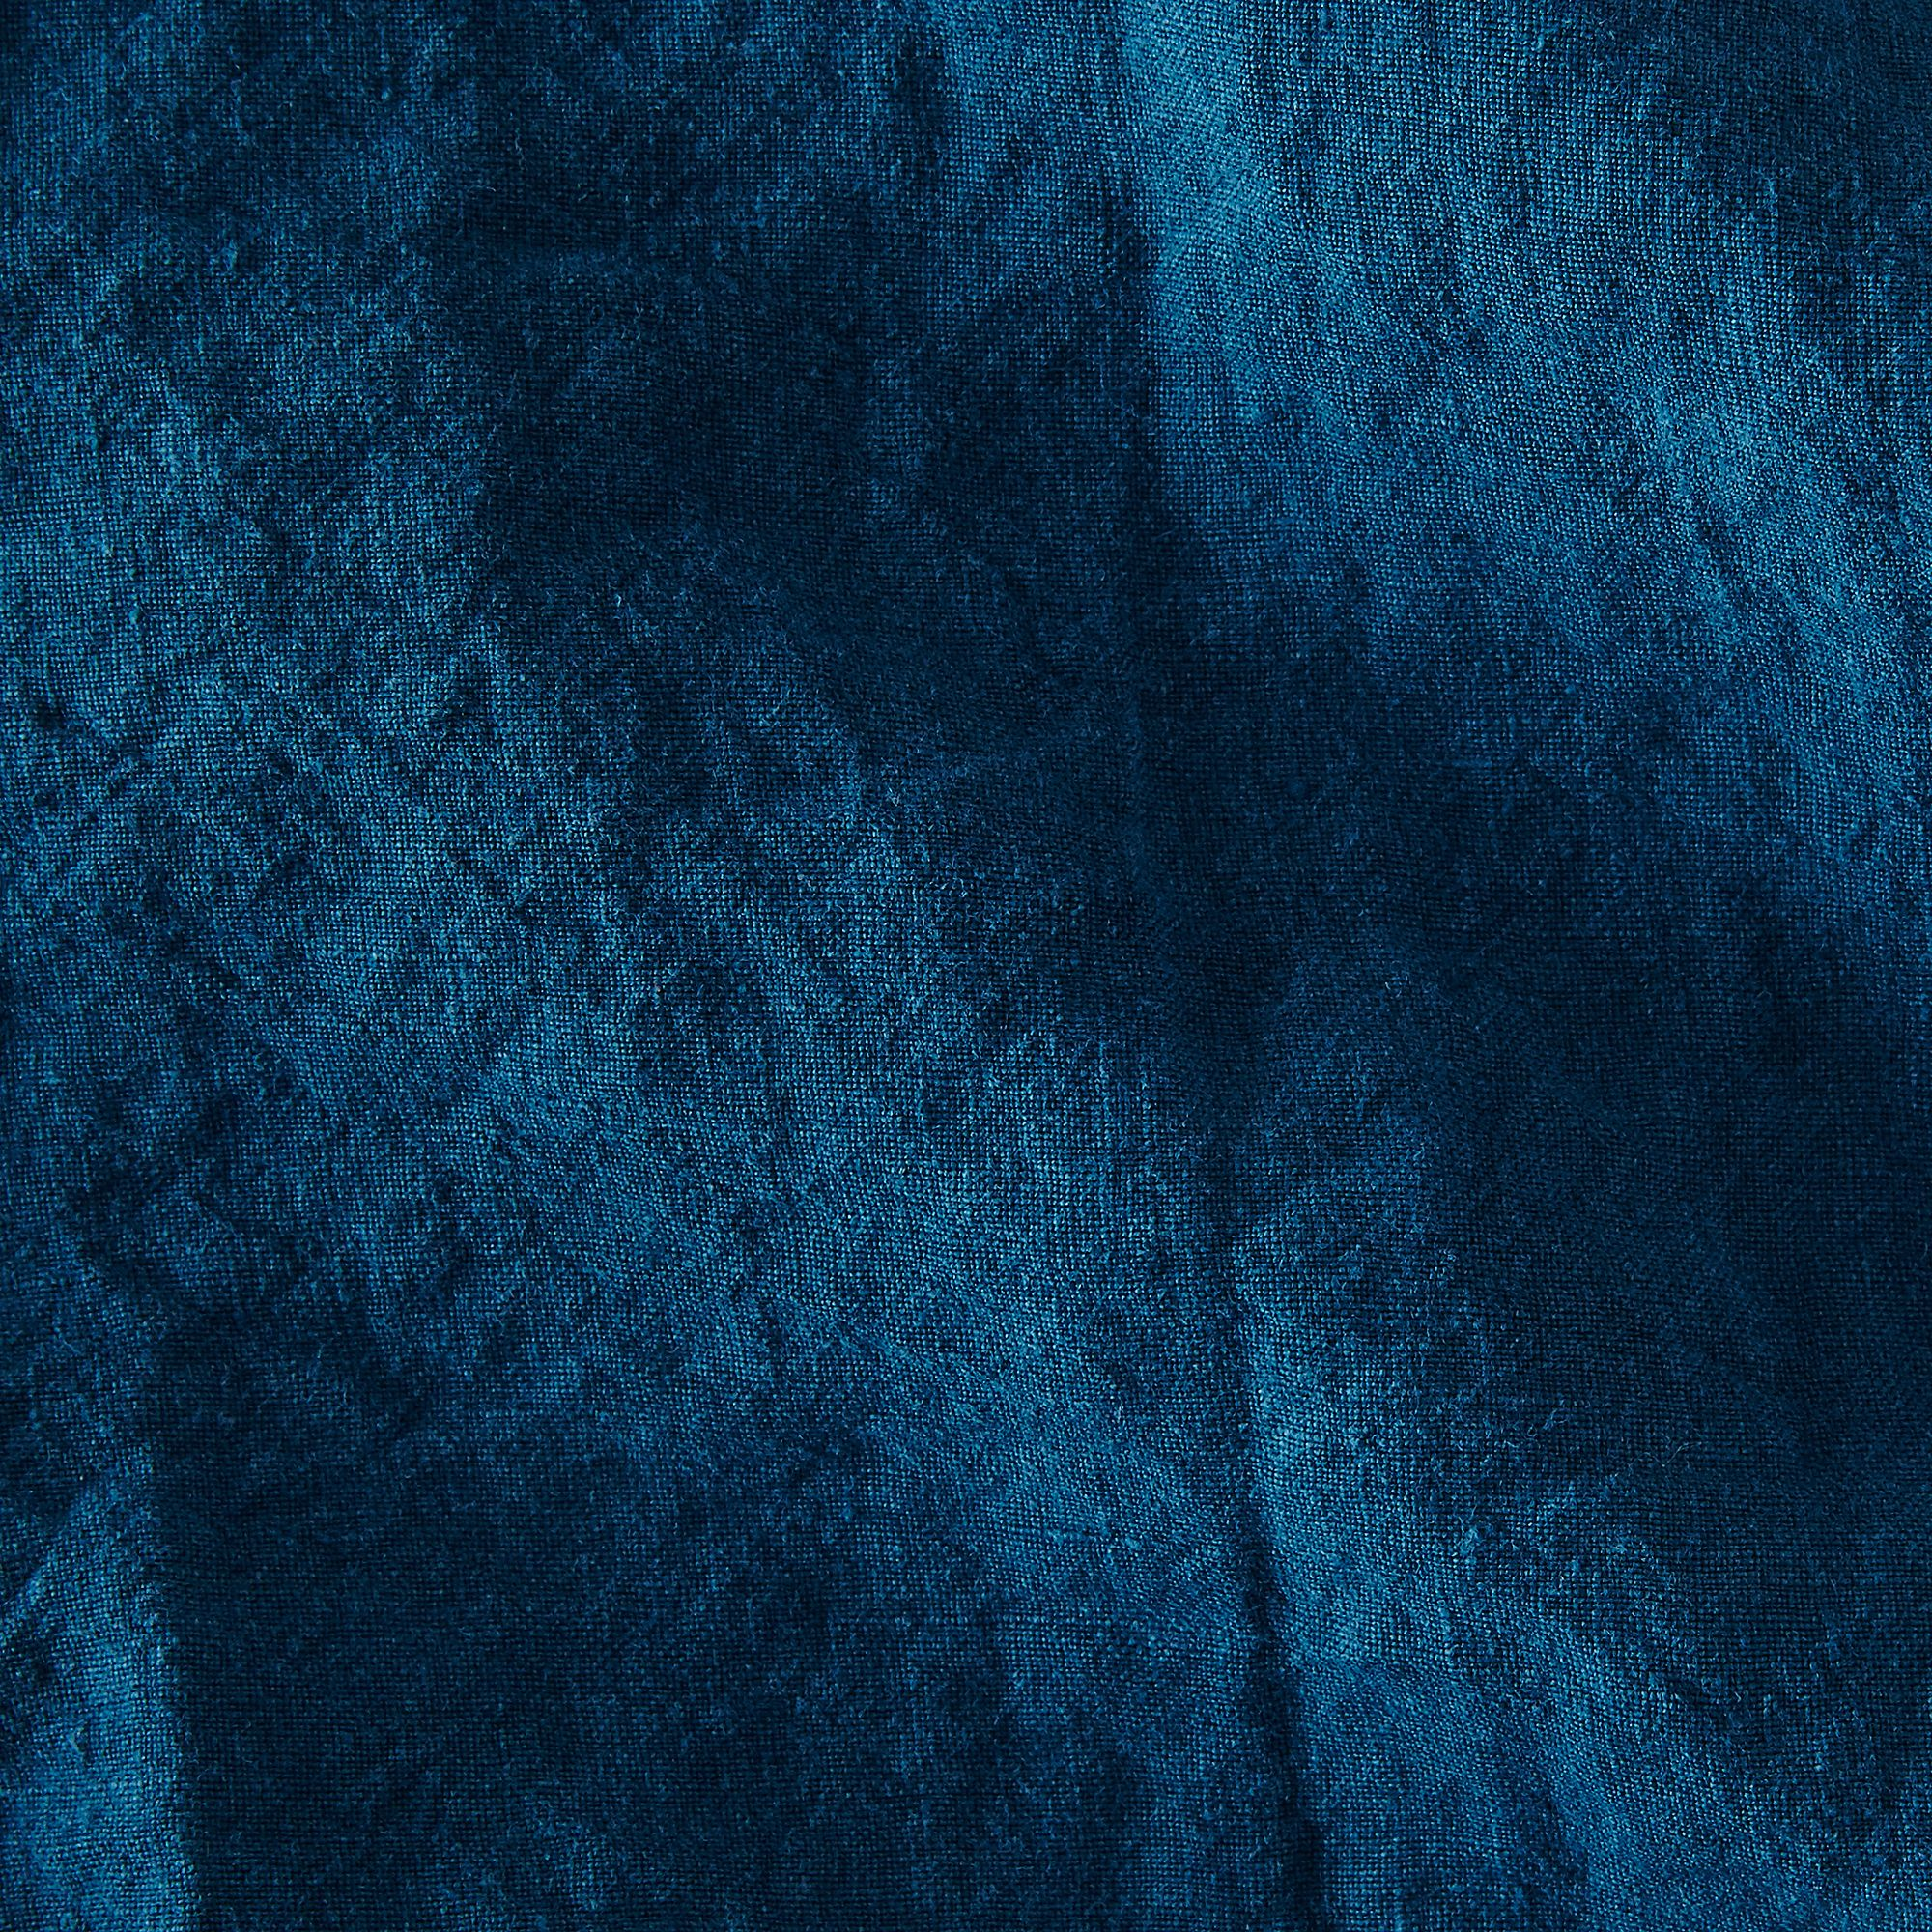 F3b48810 ad47 4931 afb3 e0c6fcdc37aa  2016 0513 hawkins new york stonewashed linen napkins set of 4 peacock silo rocky luten 001